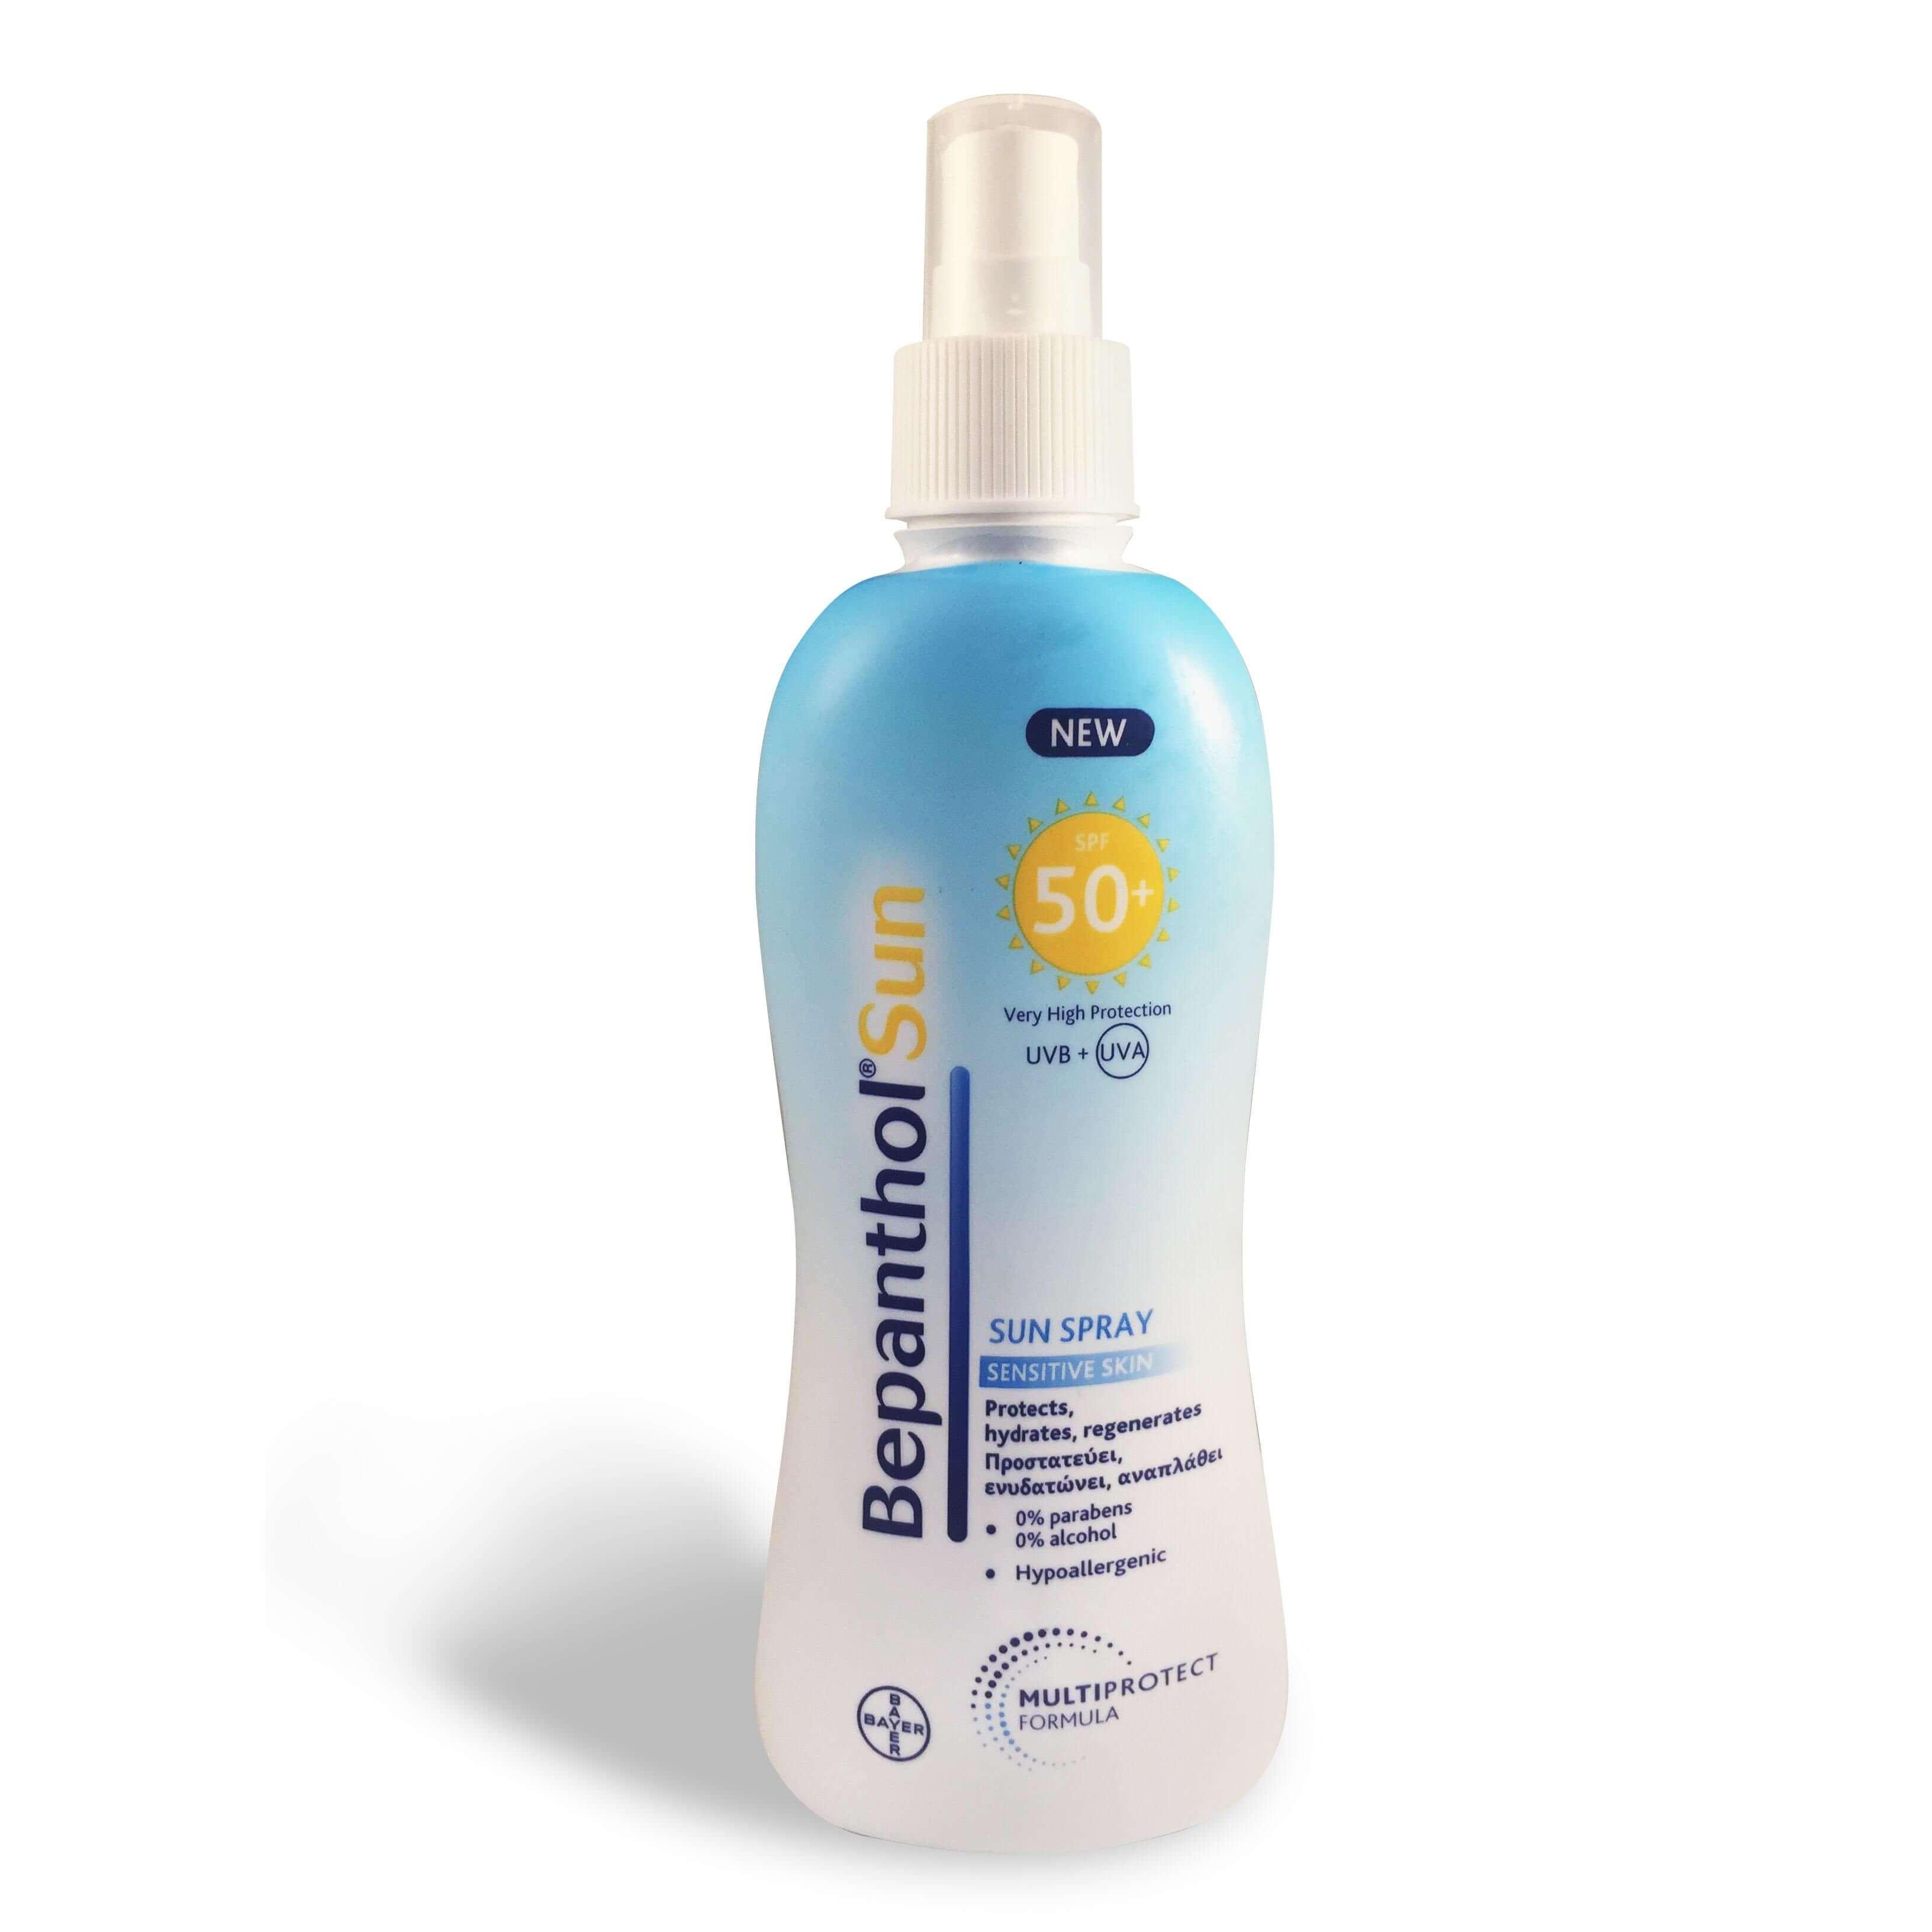 Bepanthol Sun Lotion Spray Spf50+ Αντηλιακό Γαλάκτωμα Σώματος Για Το Ευαίσθητο Δέρμα 200ml